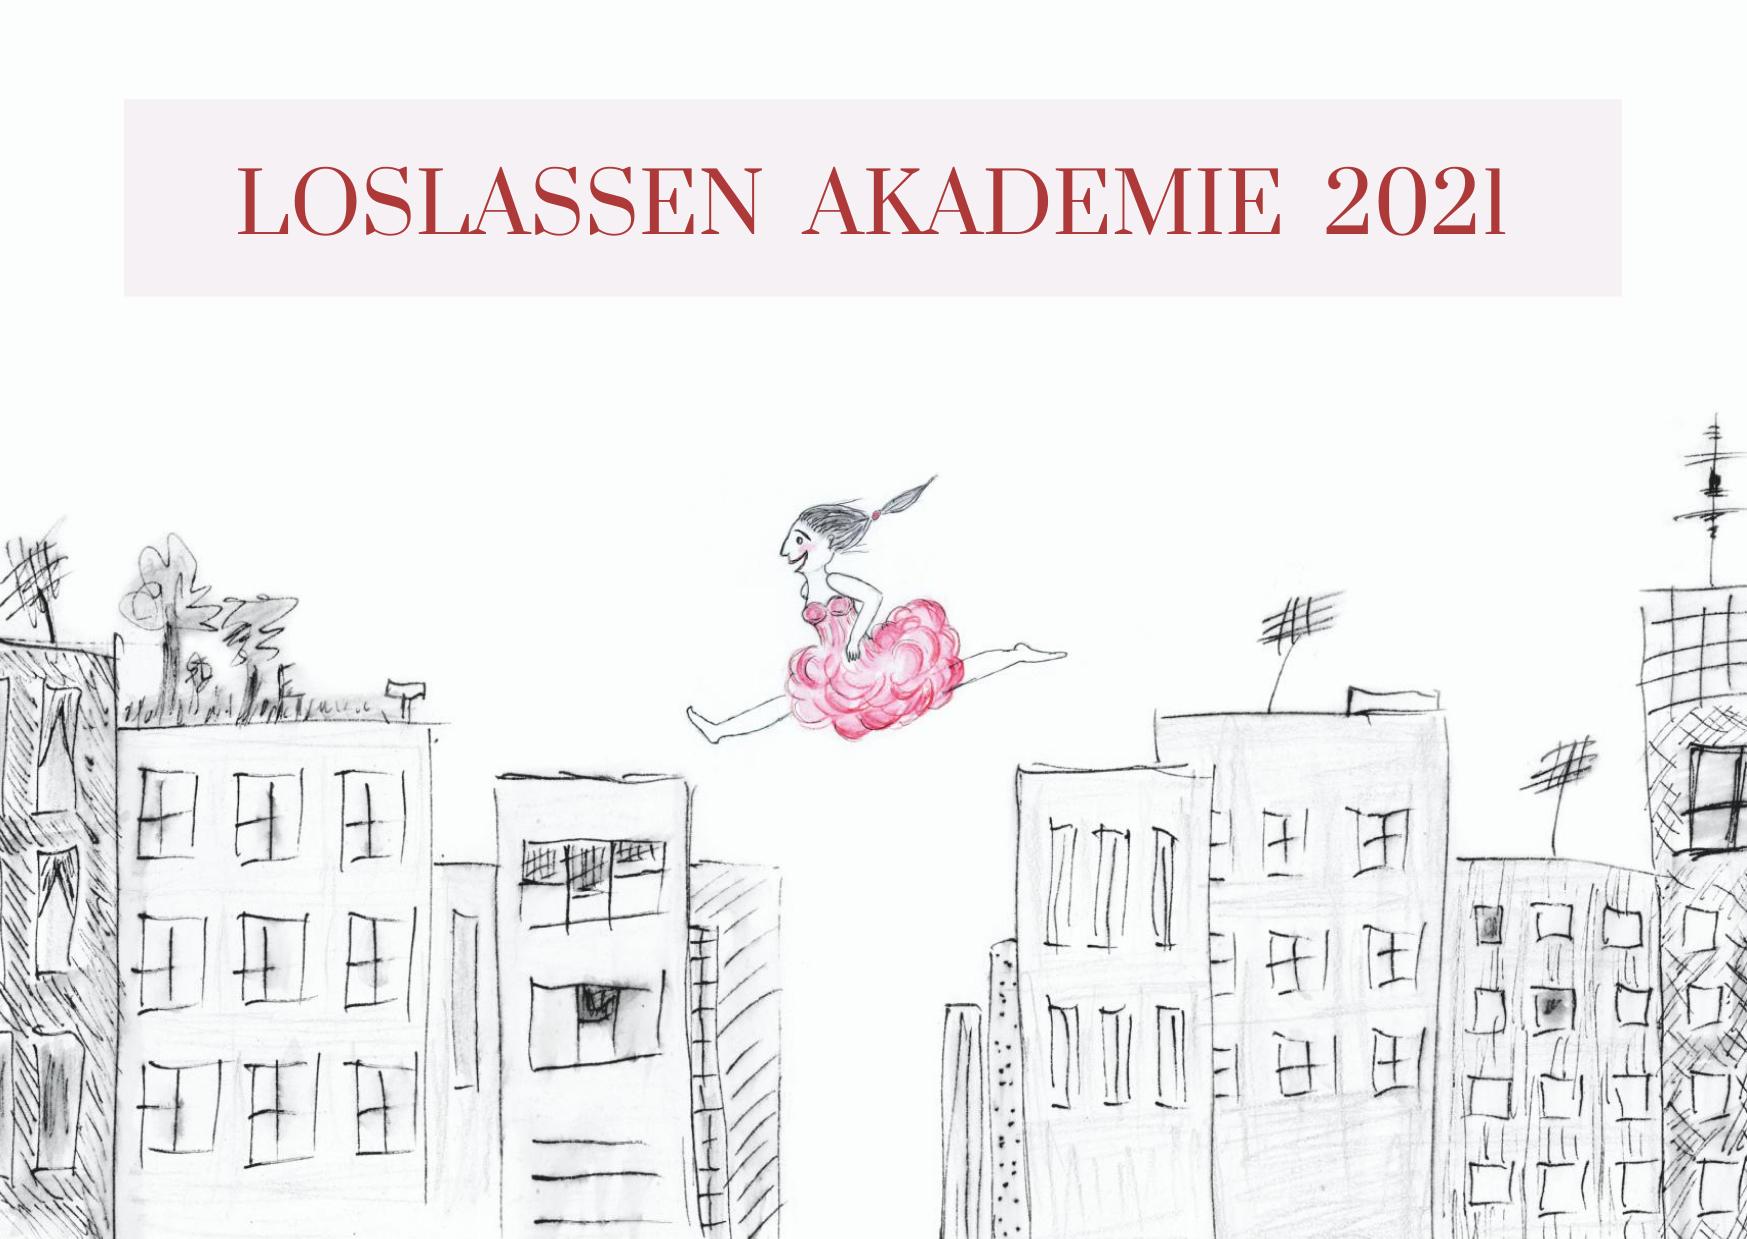 Loslassen Akademie